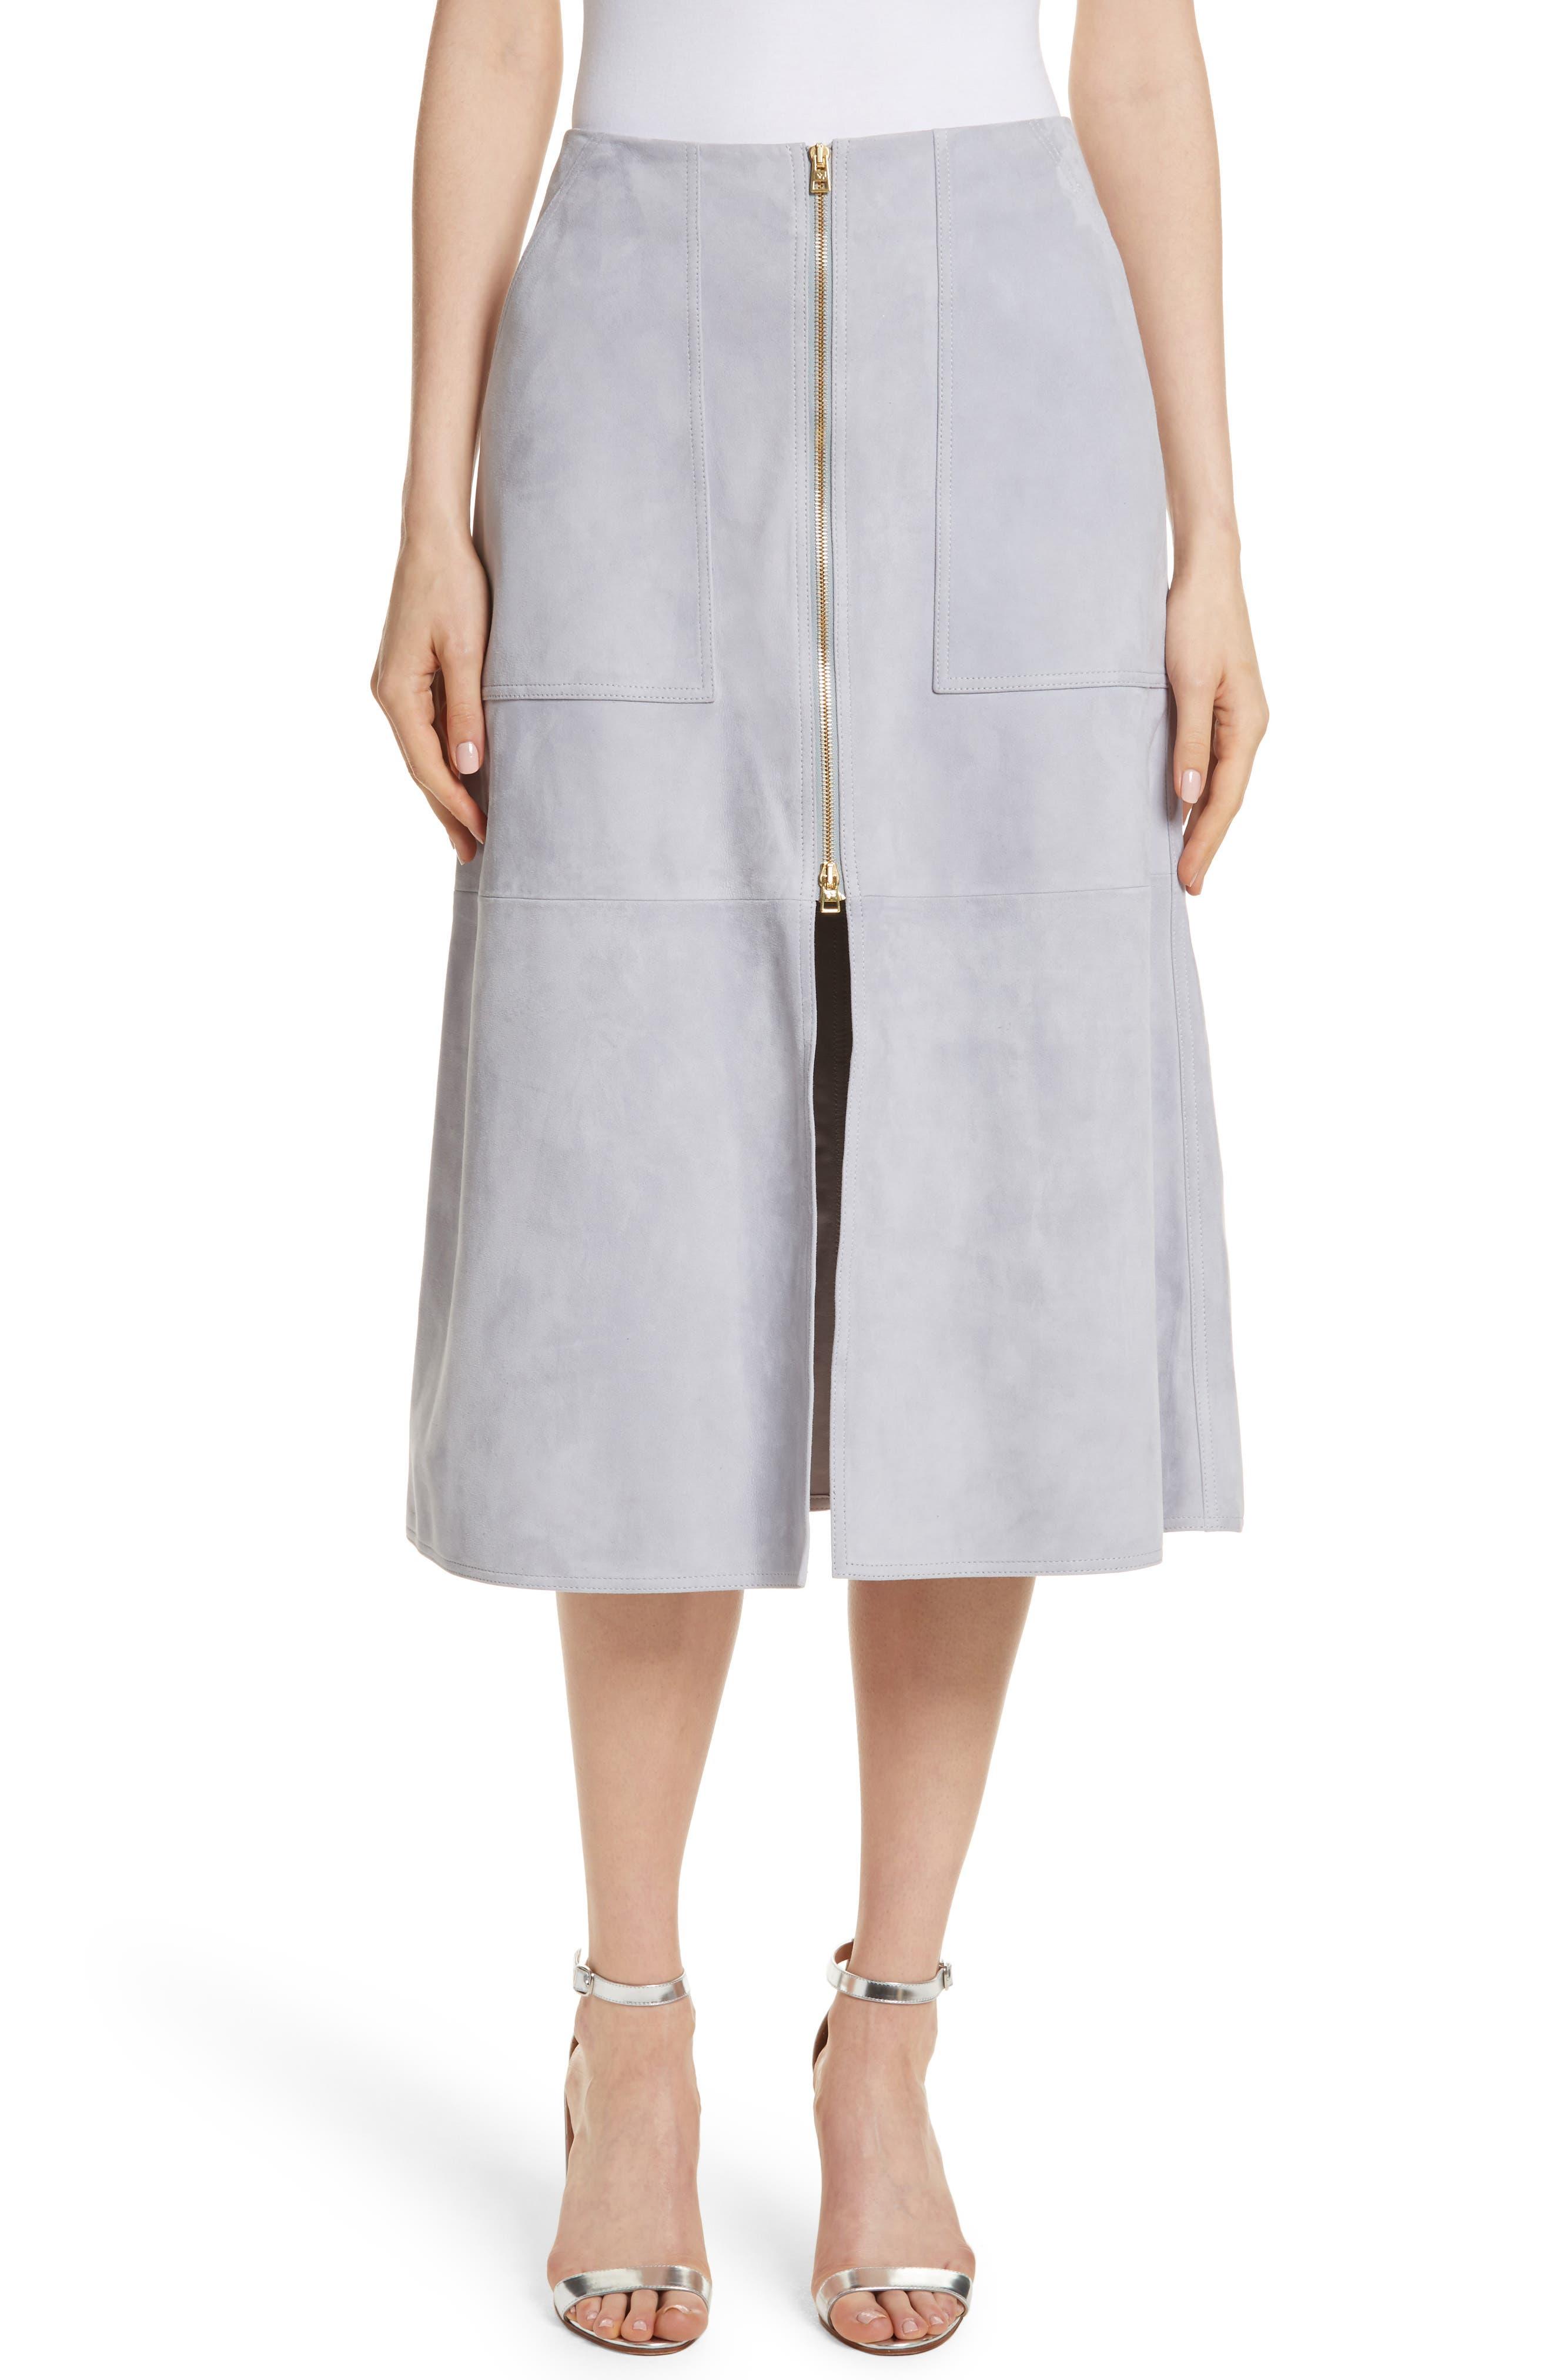 Diane von Furstenberg Patch Pocket Suede Midi Skirt,                             Main thumbnail 1, color,                             Smoke